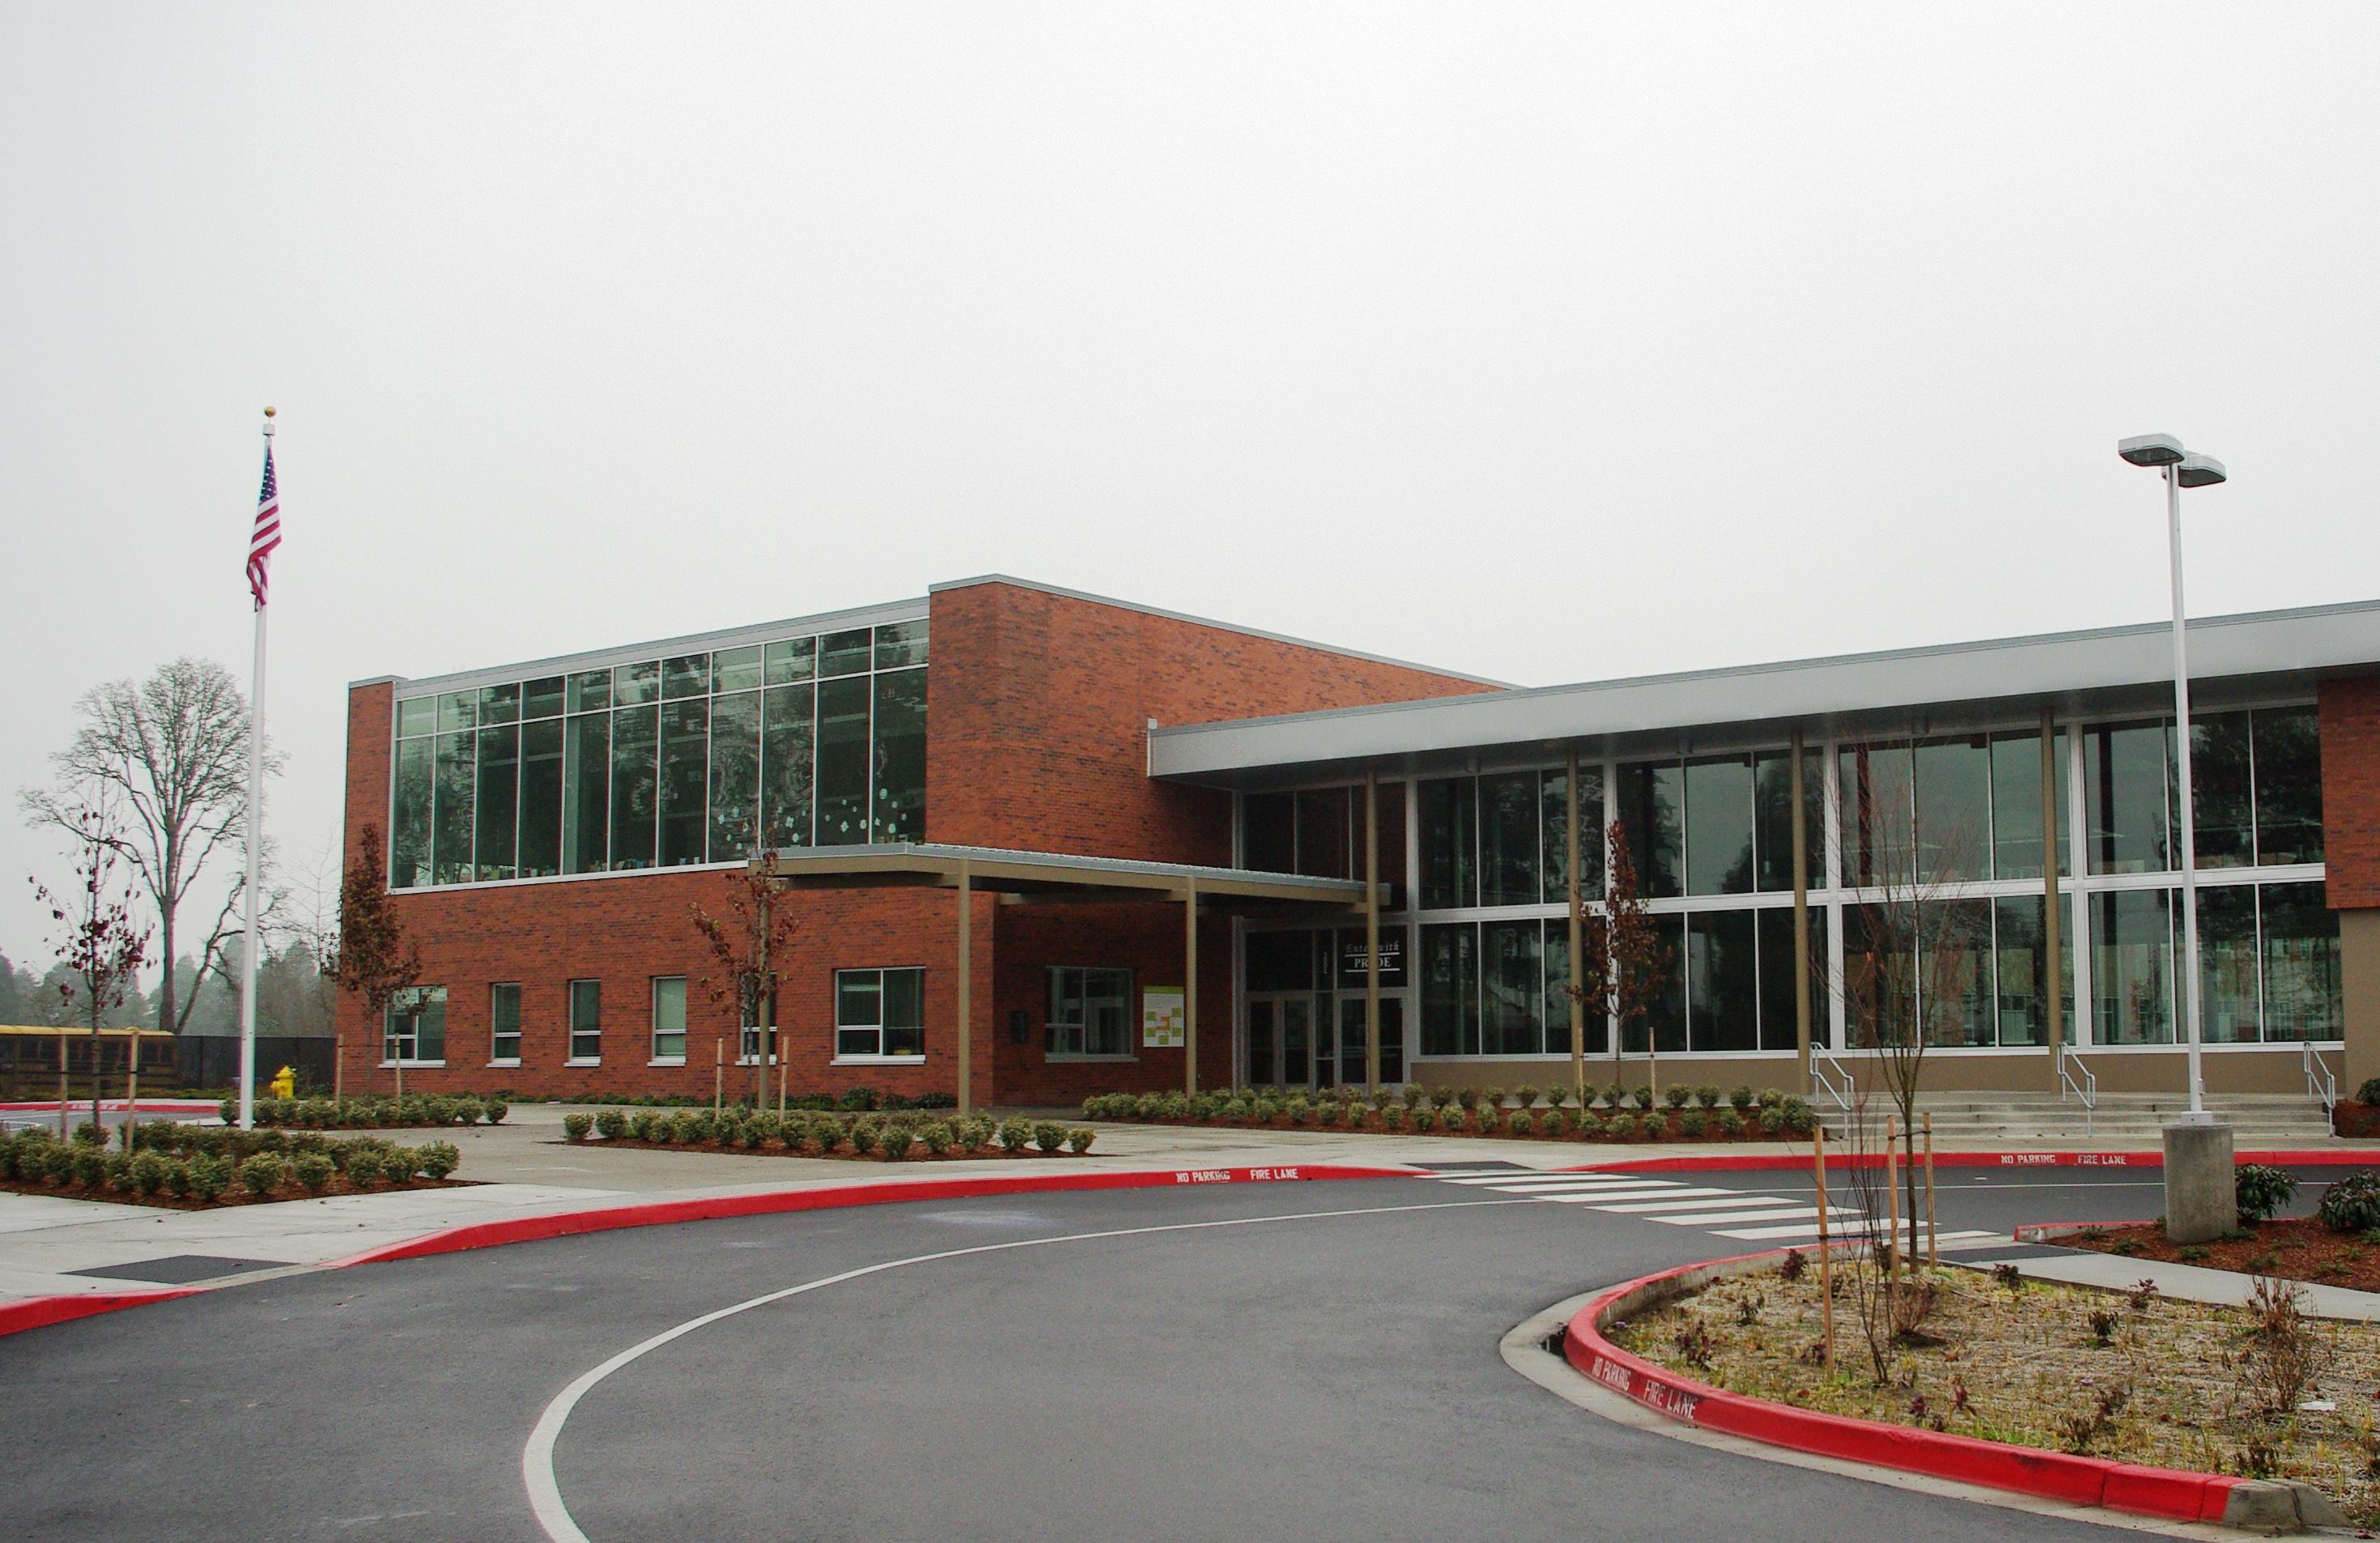 Rosedale_Elementary_School_-_Hillsboro,_